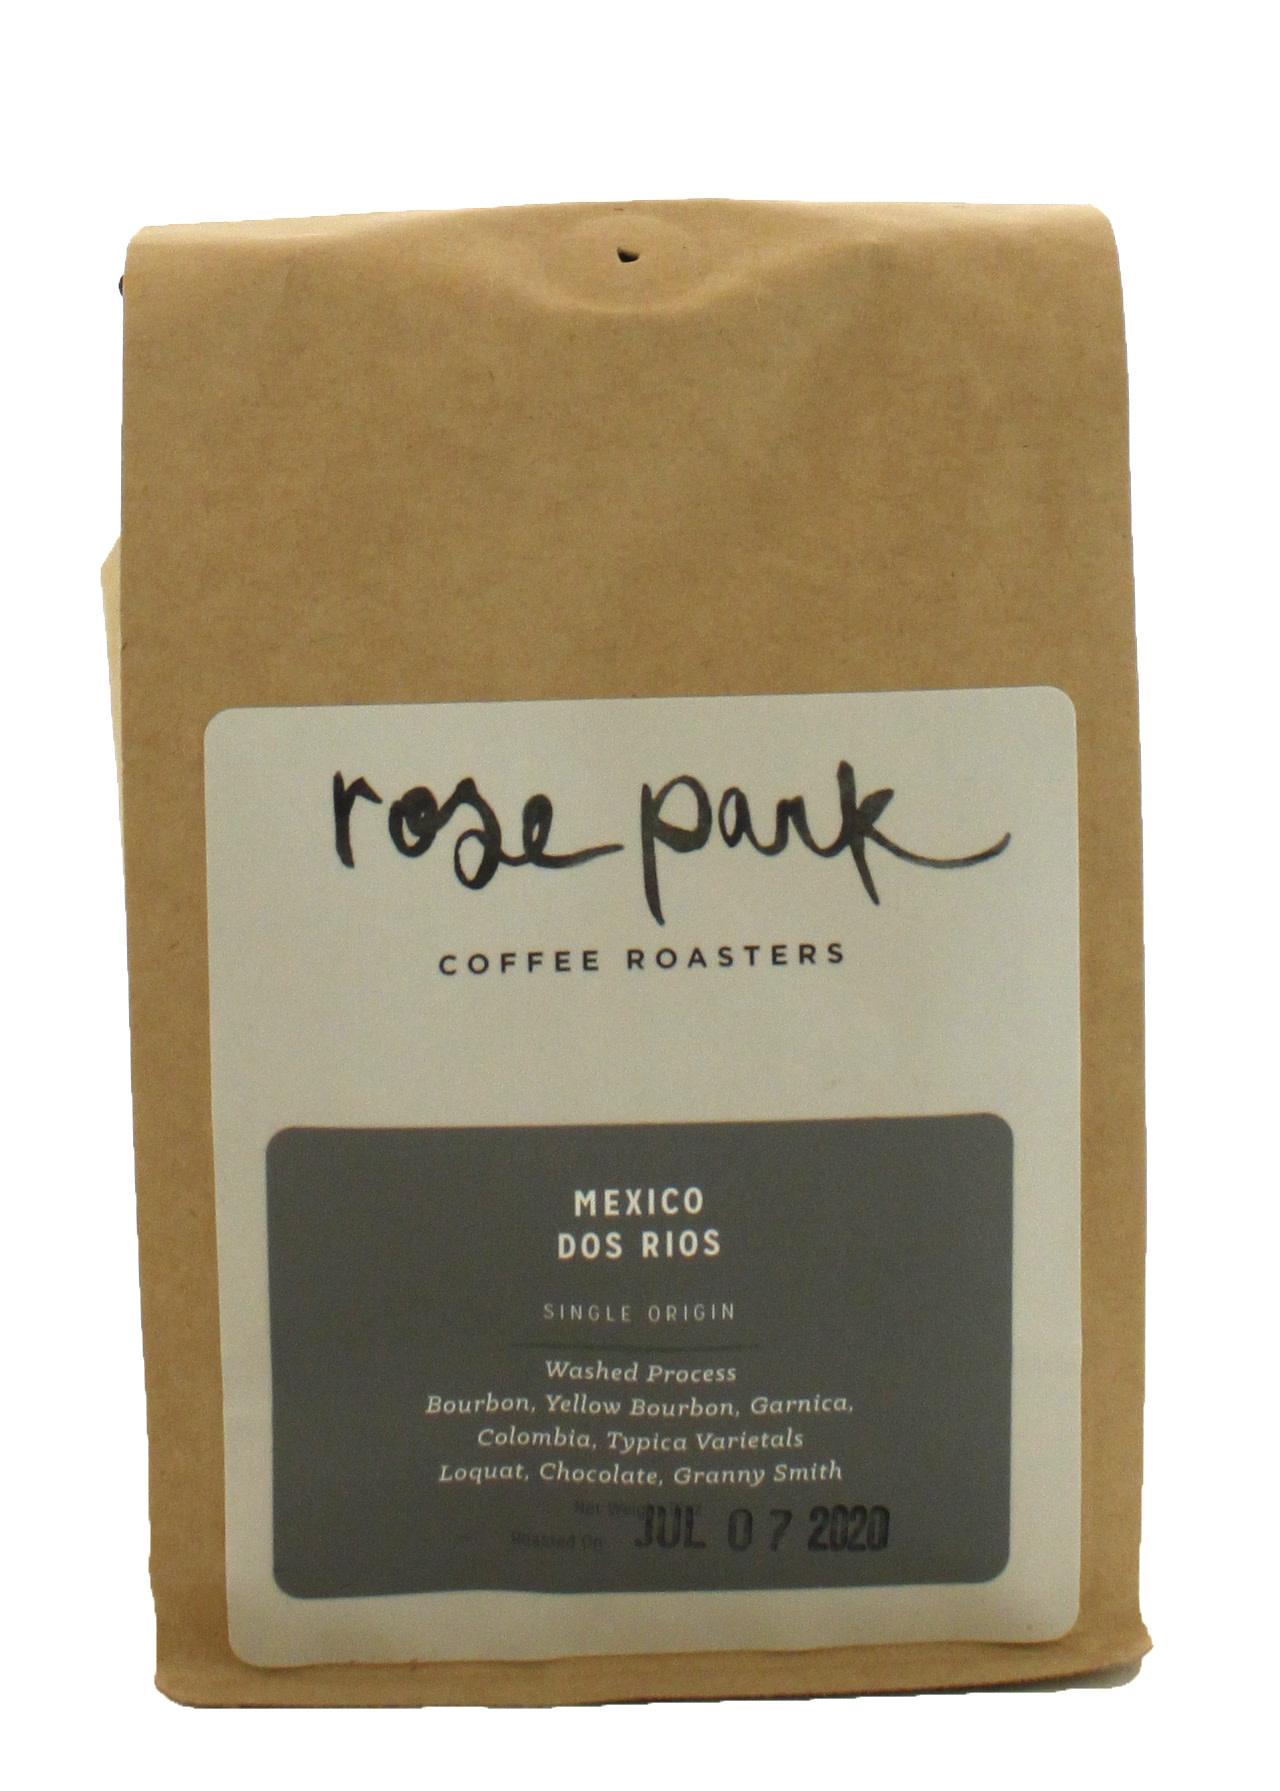 Rose Park Coffee Roasters - Mexico Dos Rios Whole Bean 12oz. Bag Long Beach, CA